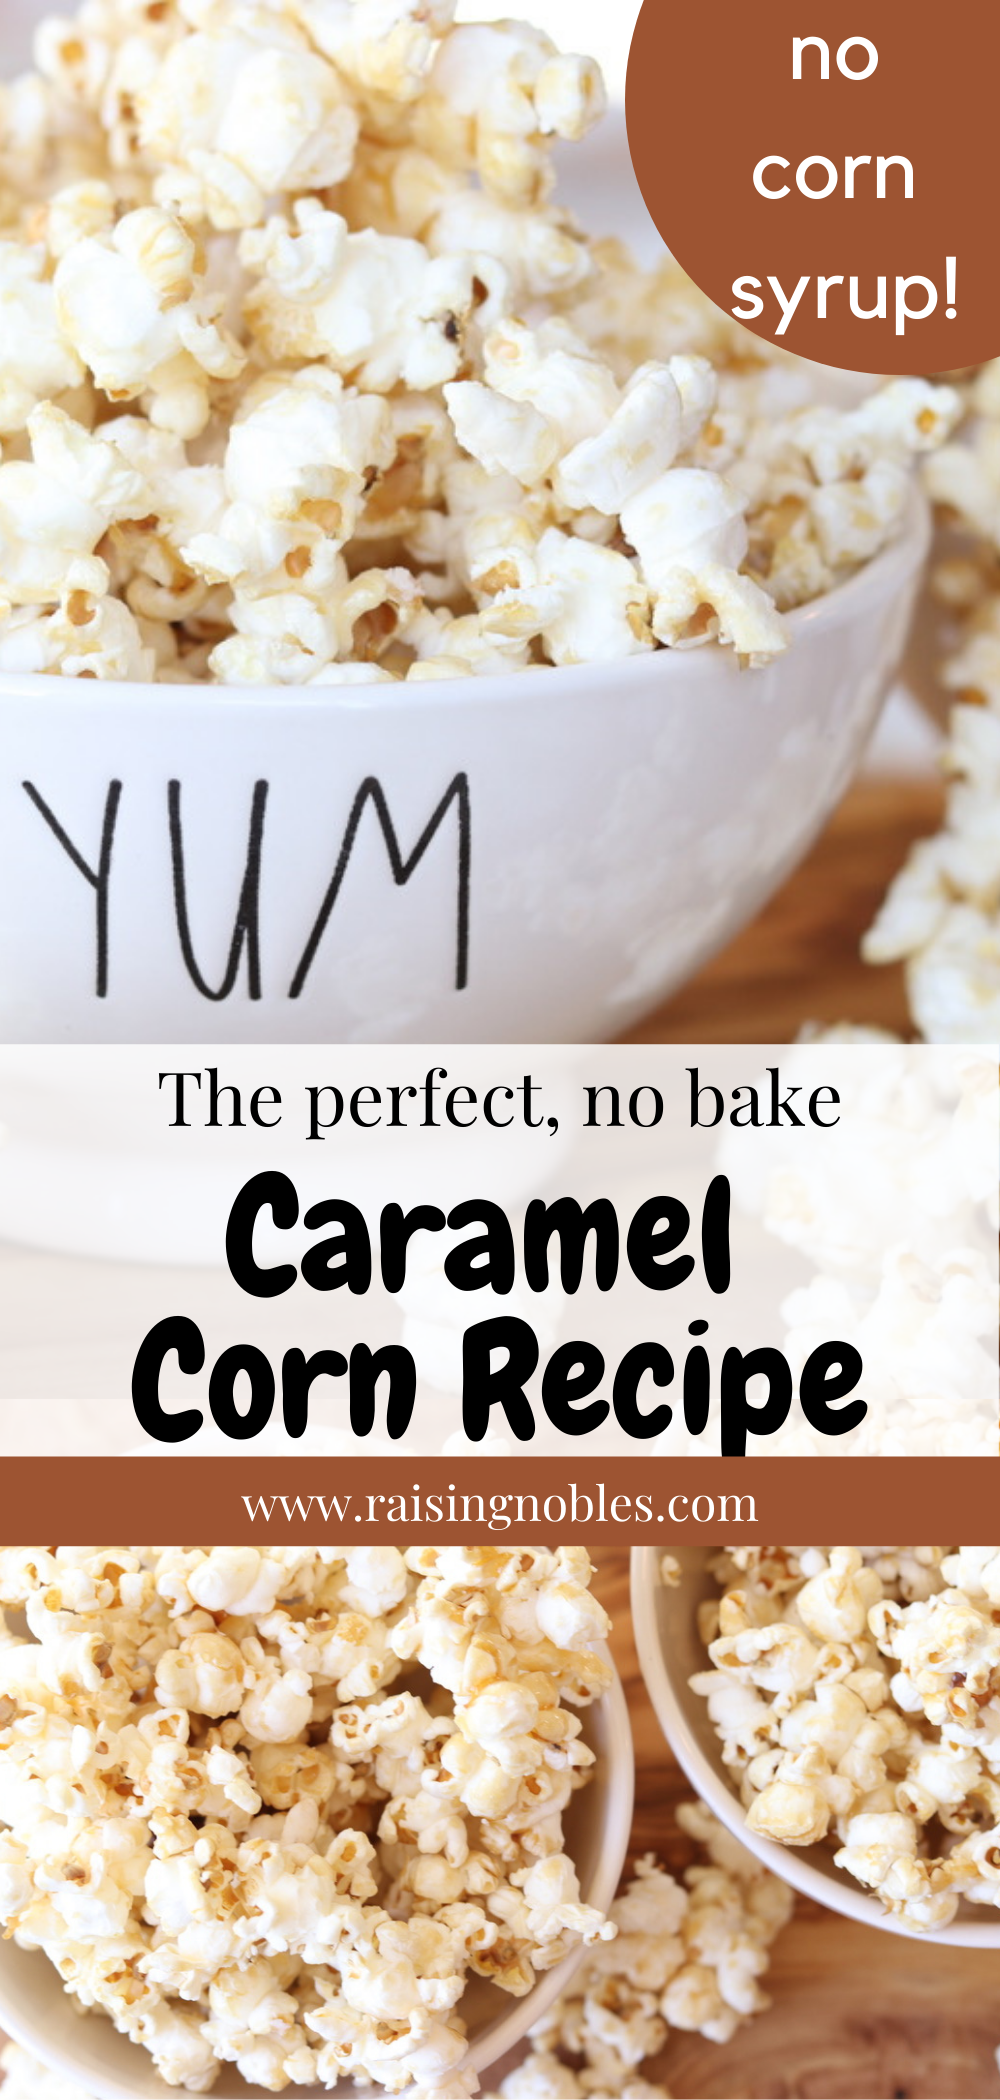 Caramel Popcorn Without Corn Syrup Raising Nobles Recipe Corn Recipes Caramel Corn Recipes Caramel Recipe Without Corn Syrup